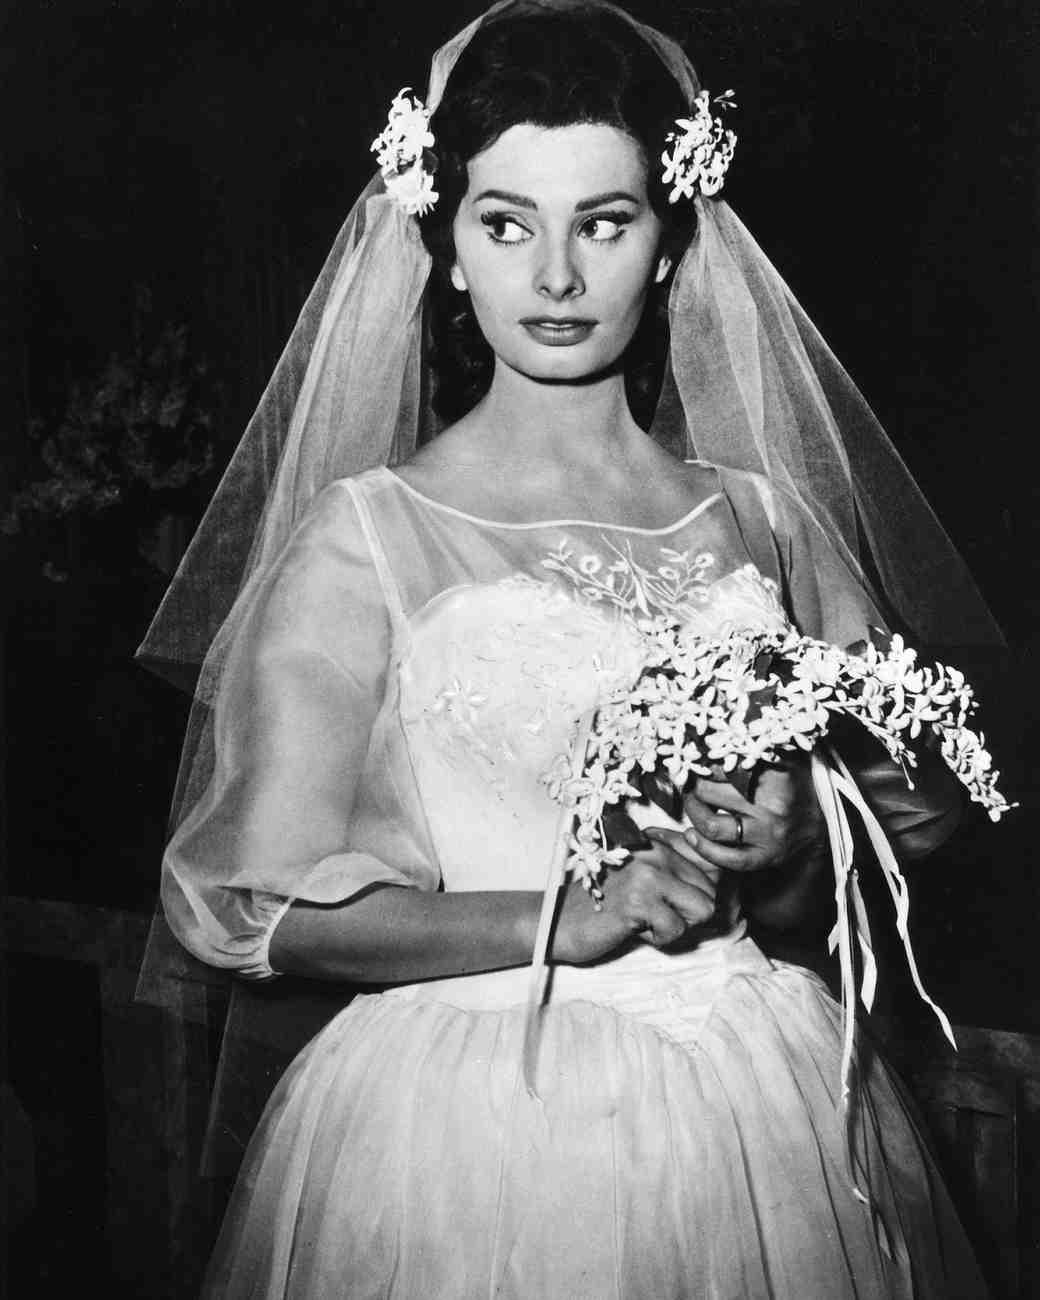 movie-wedding-dresses-the-black-orchid-sophia-loren-0516.jpg